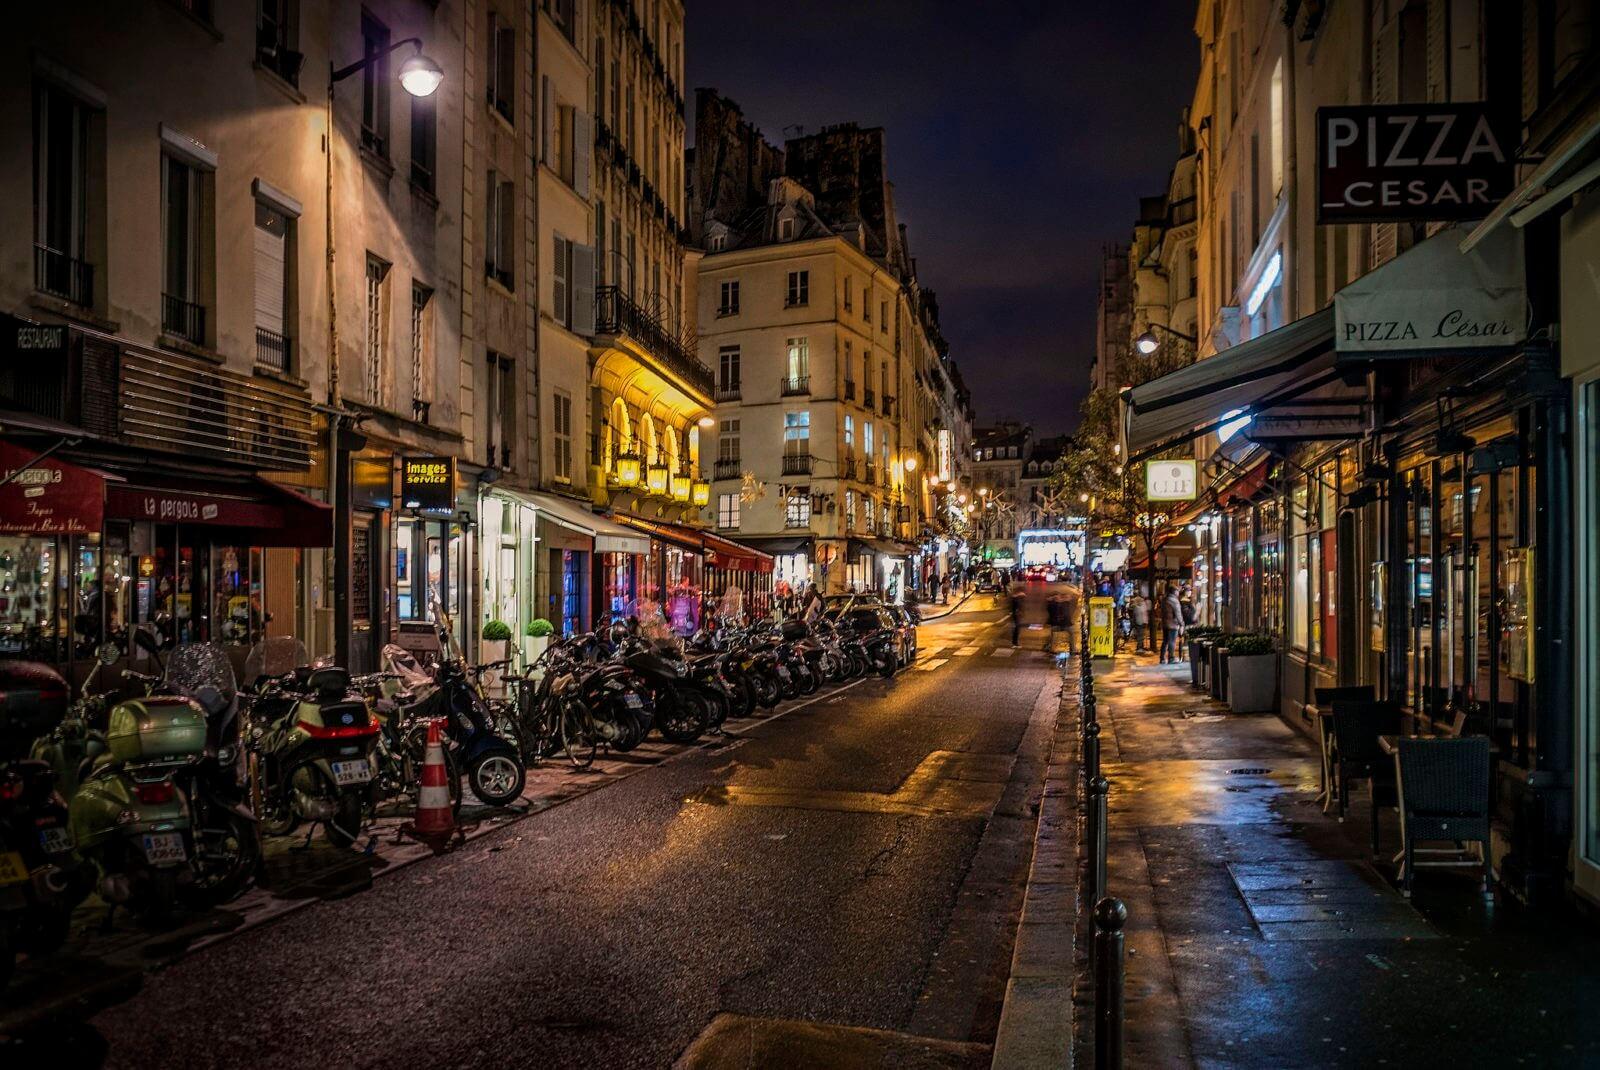 Paryż. Fot. Luc Mercelis/Flickr